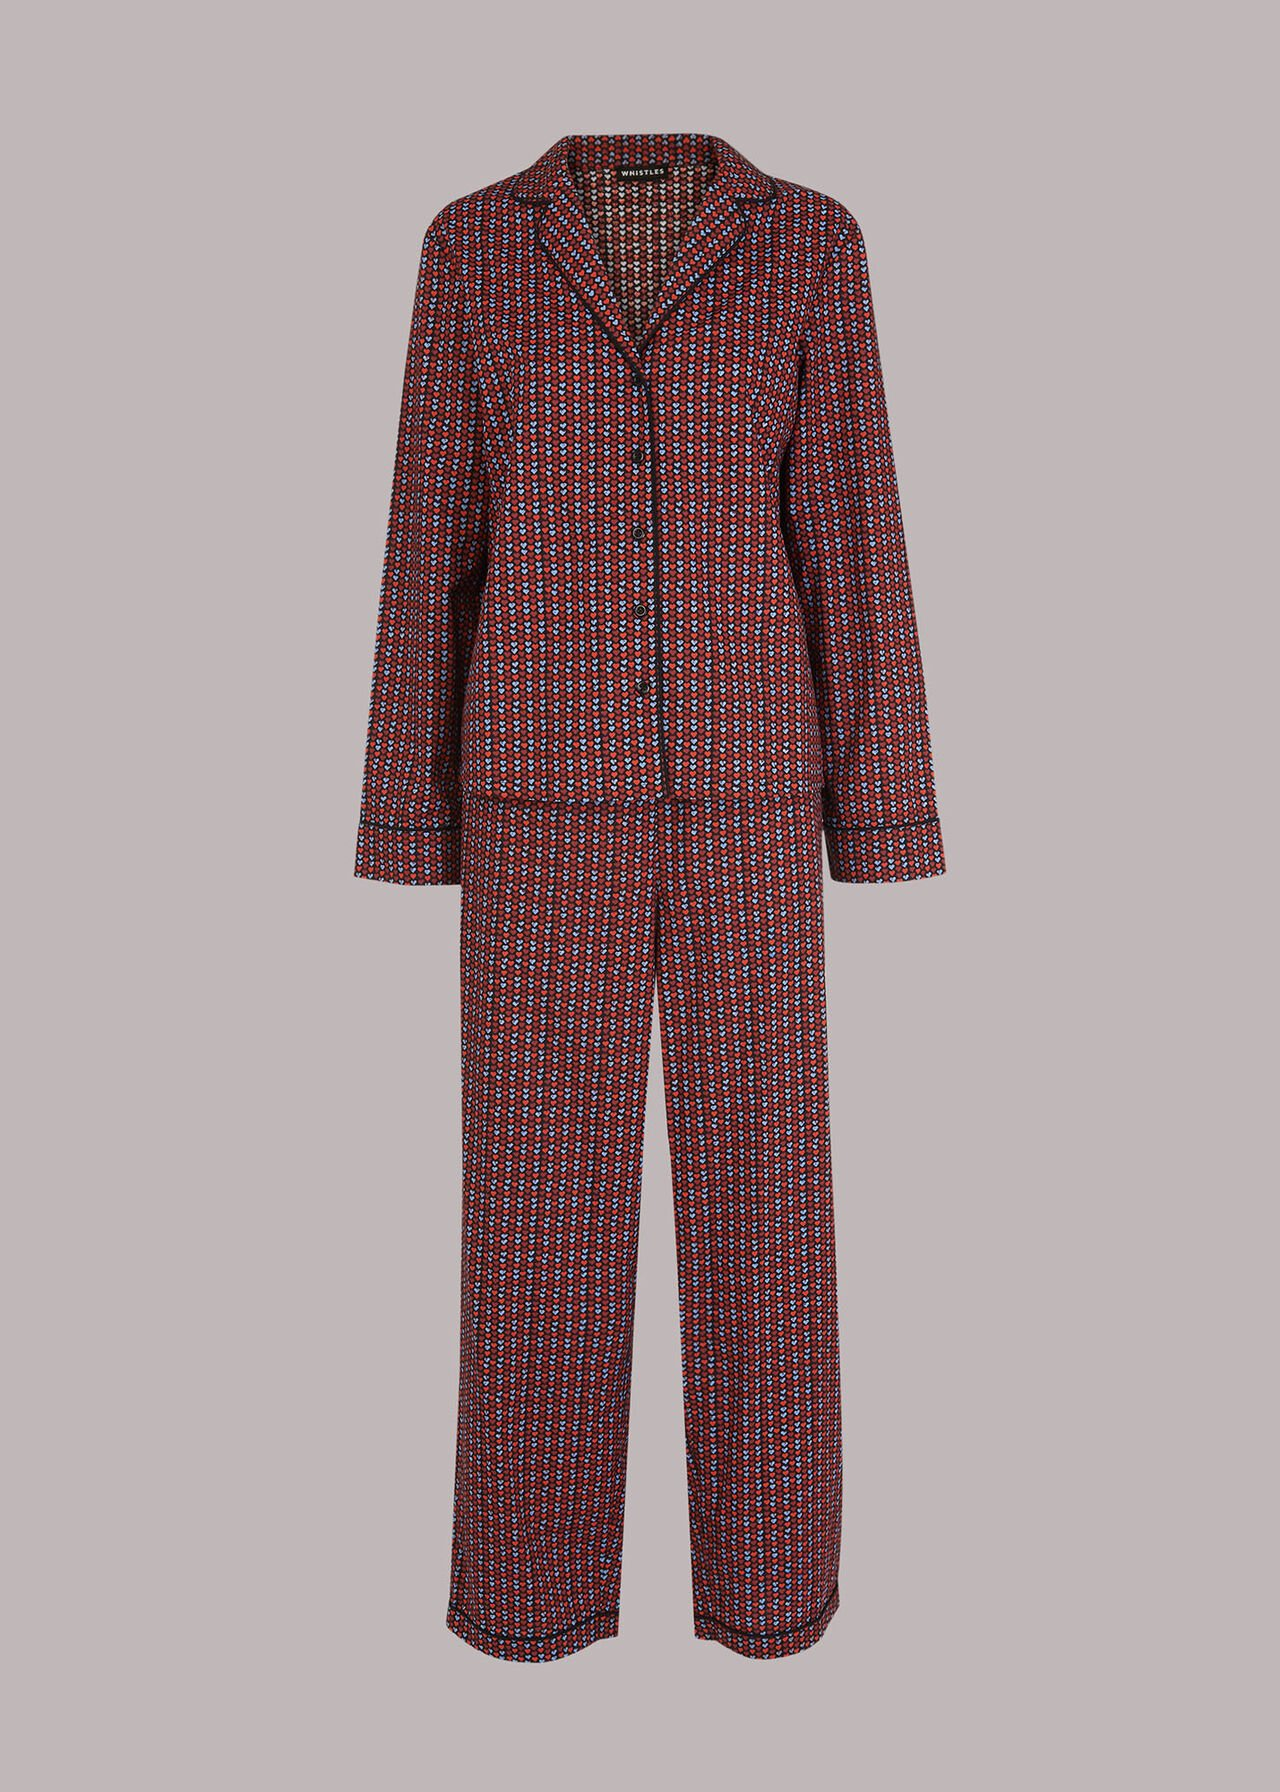 Heart Print Cotton Pyjamas